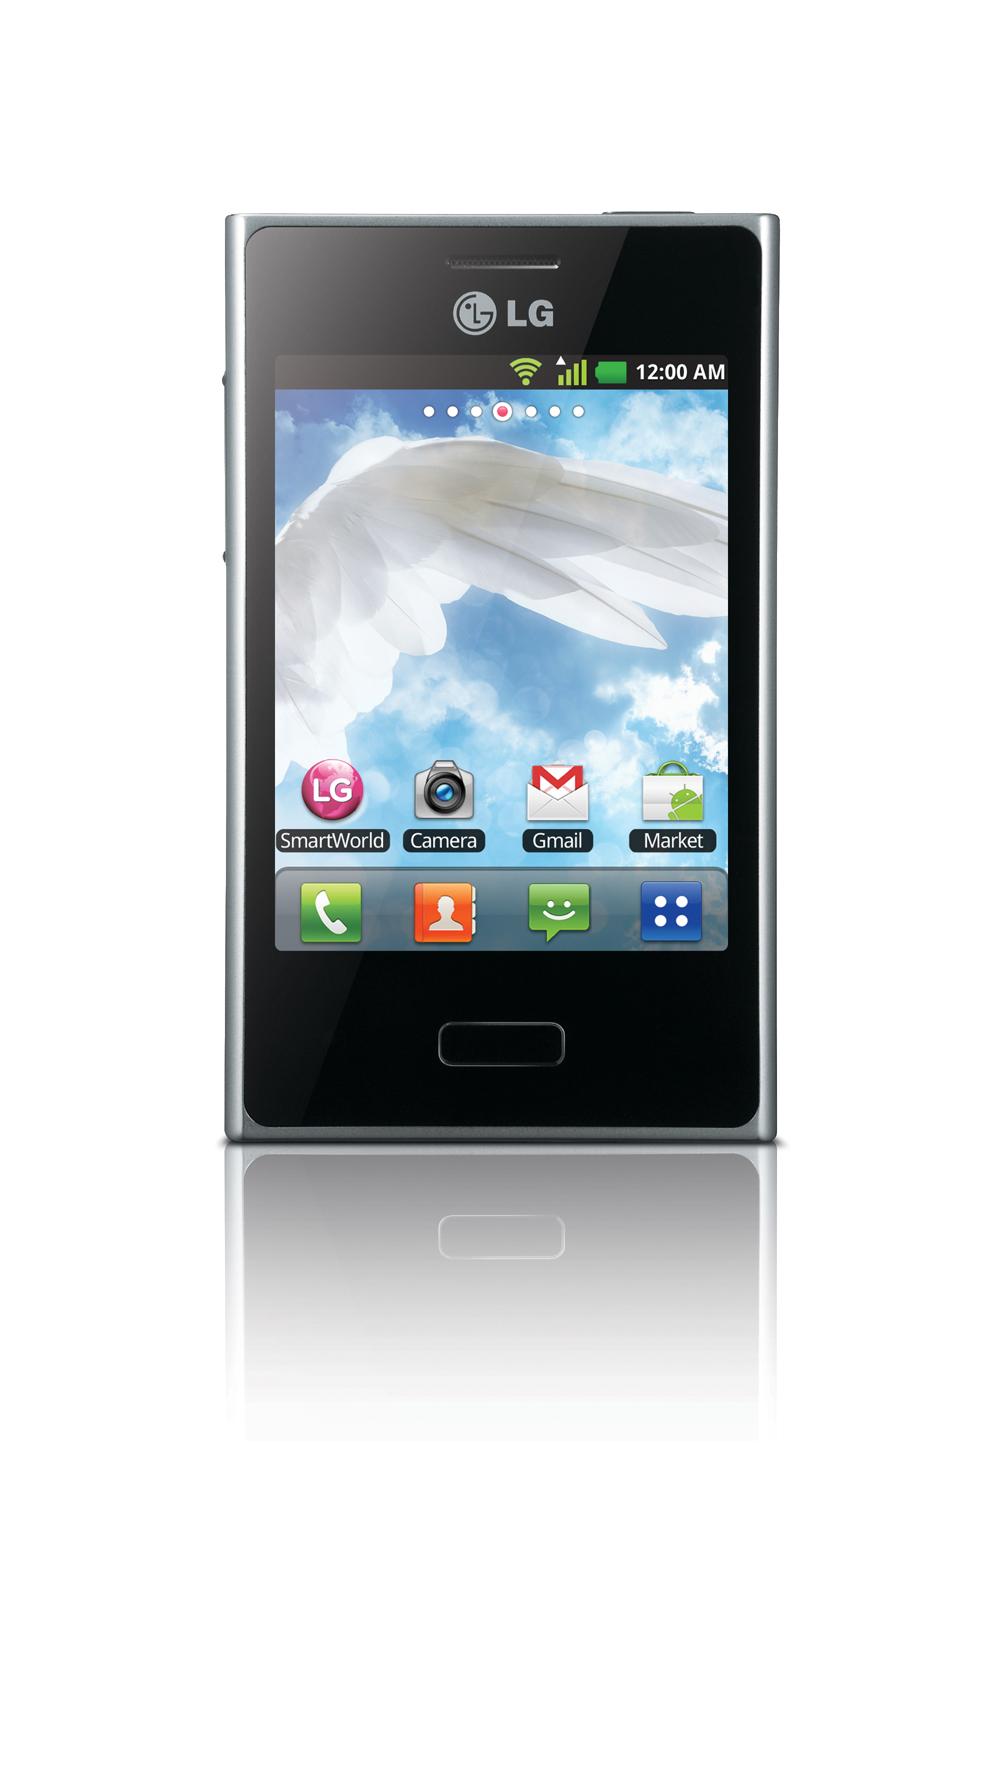 Close view of LG's New Optimus L3 smartphone